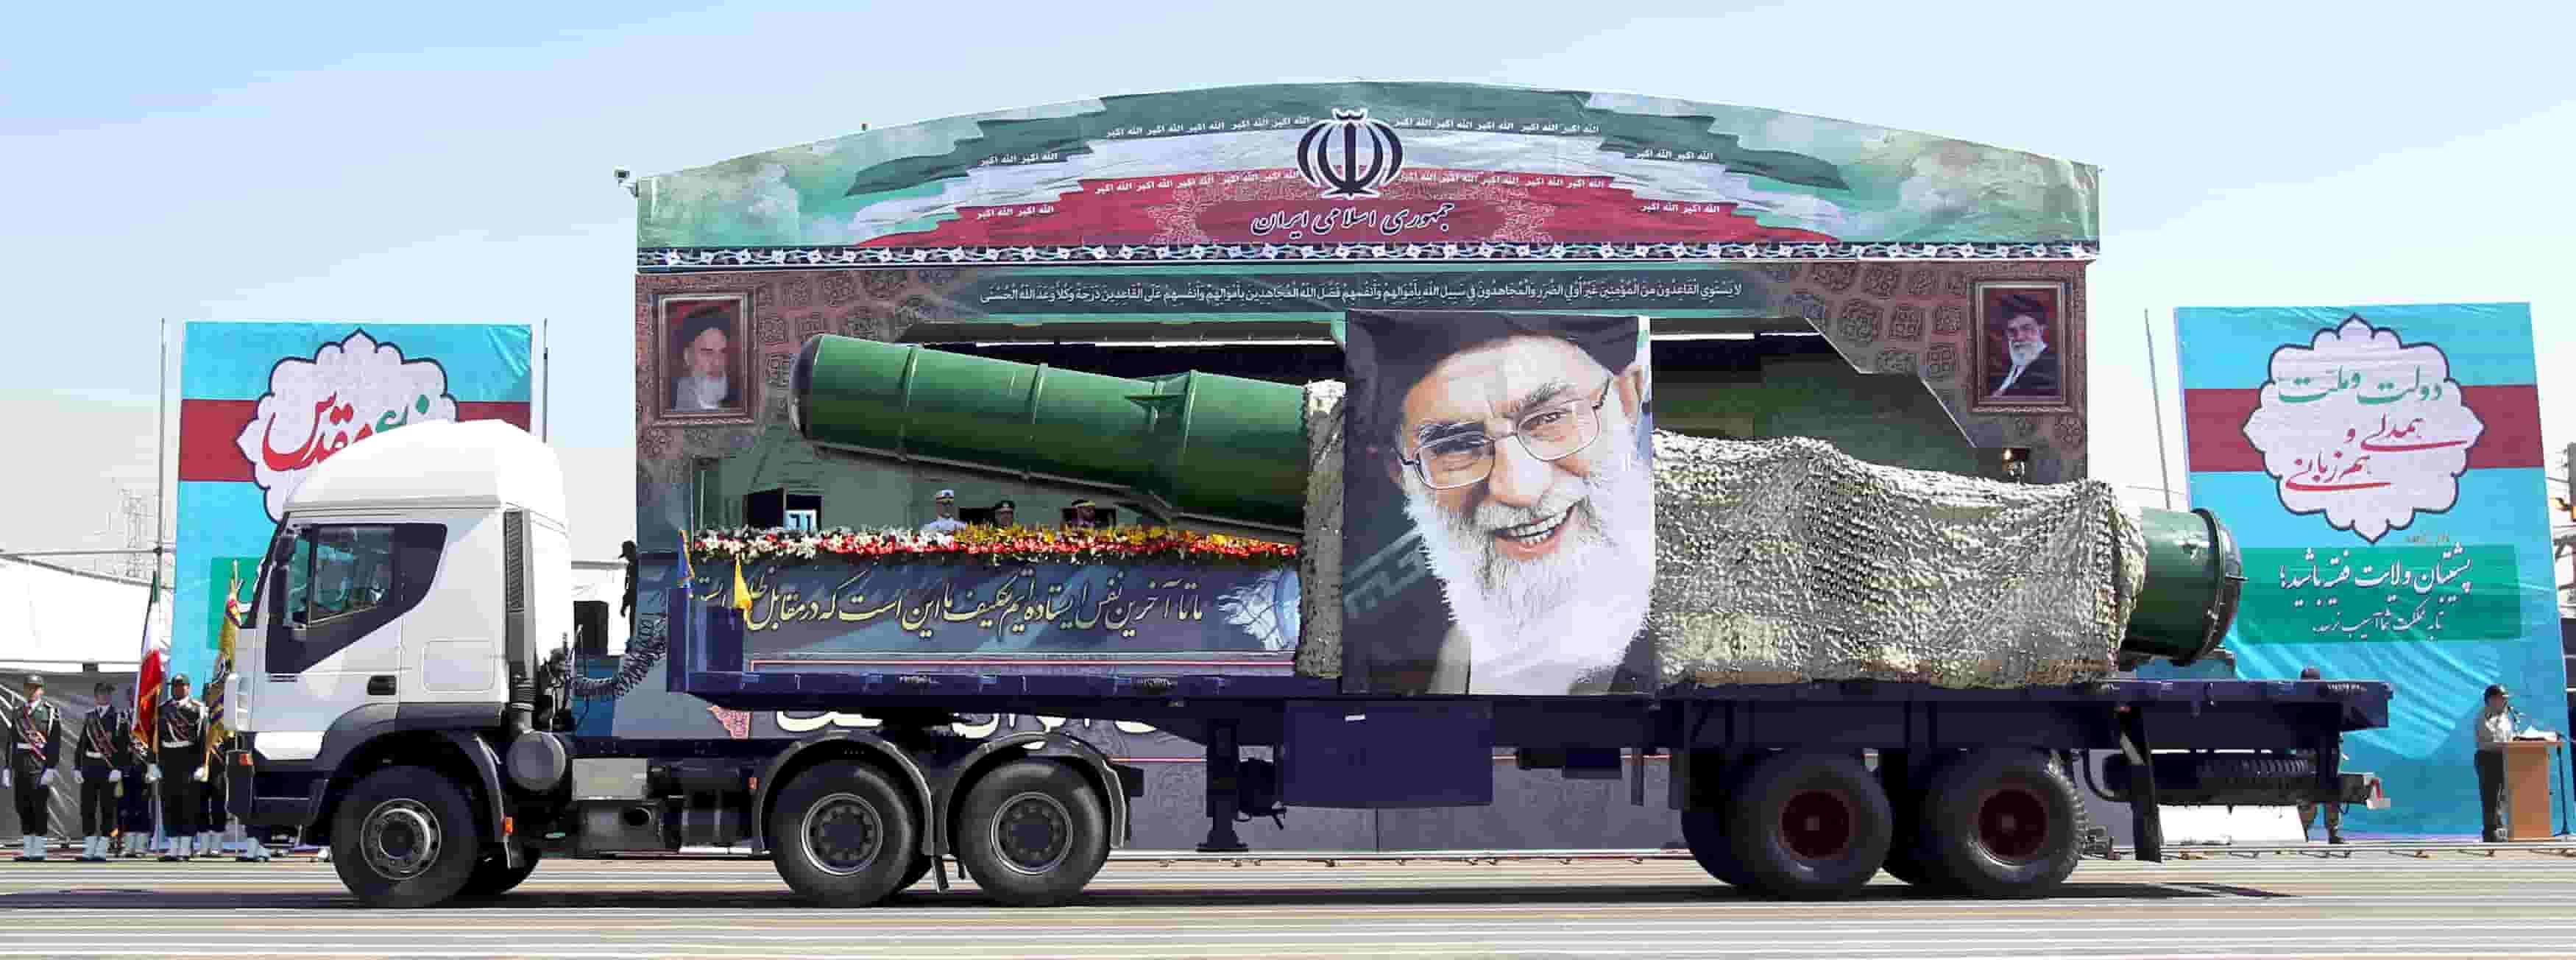 iran-missile-khamenei-min